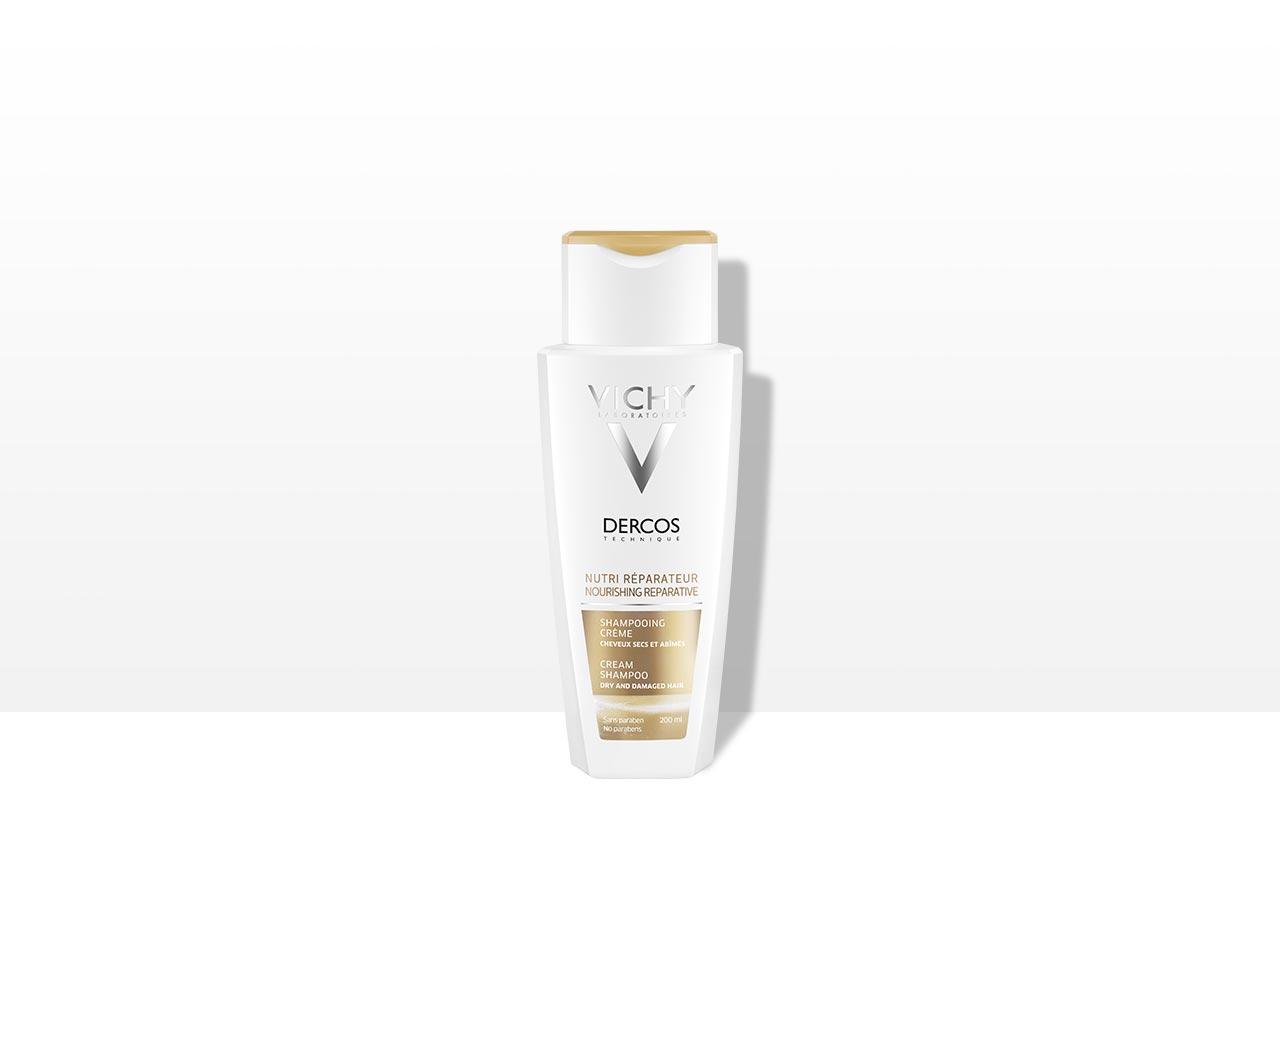 Nourishing & ReparativeCream Shampoo for Dry & Damaged hair